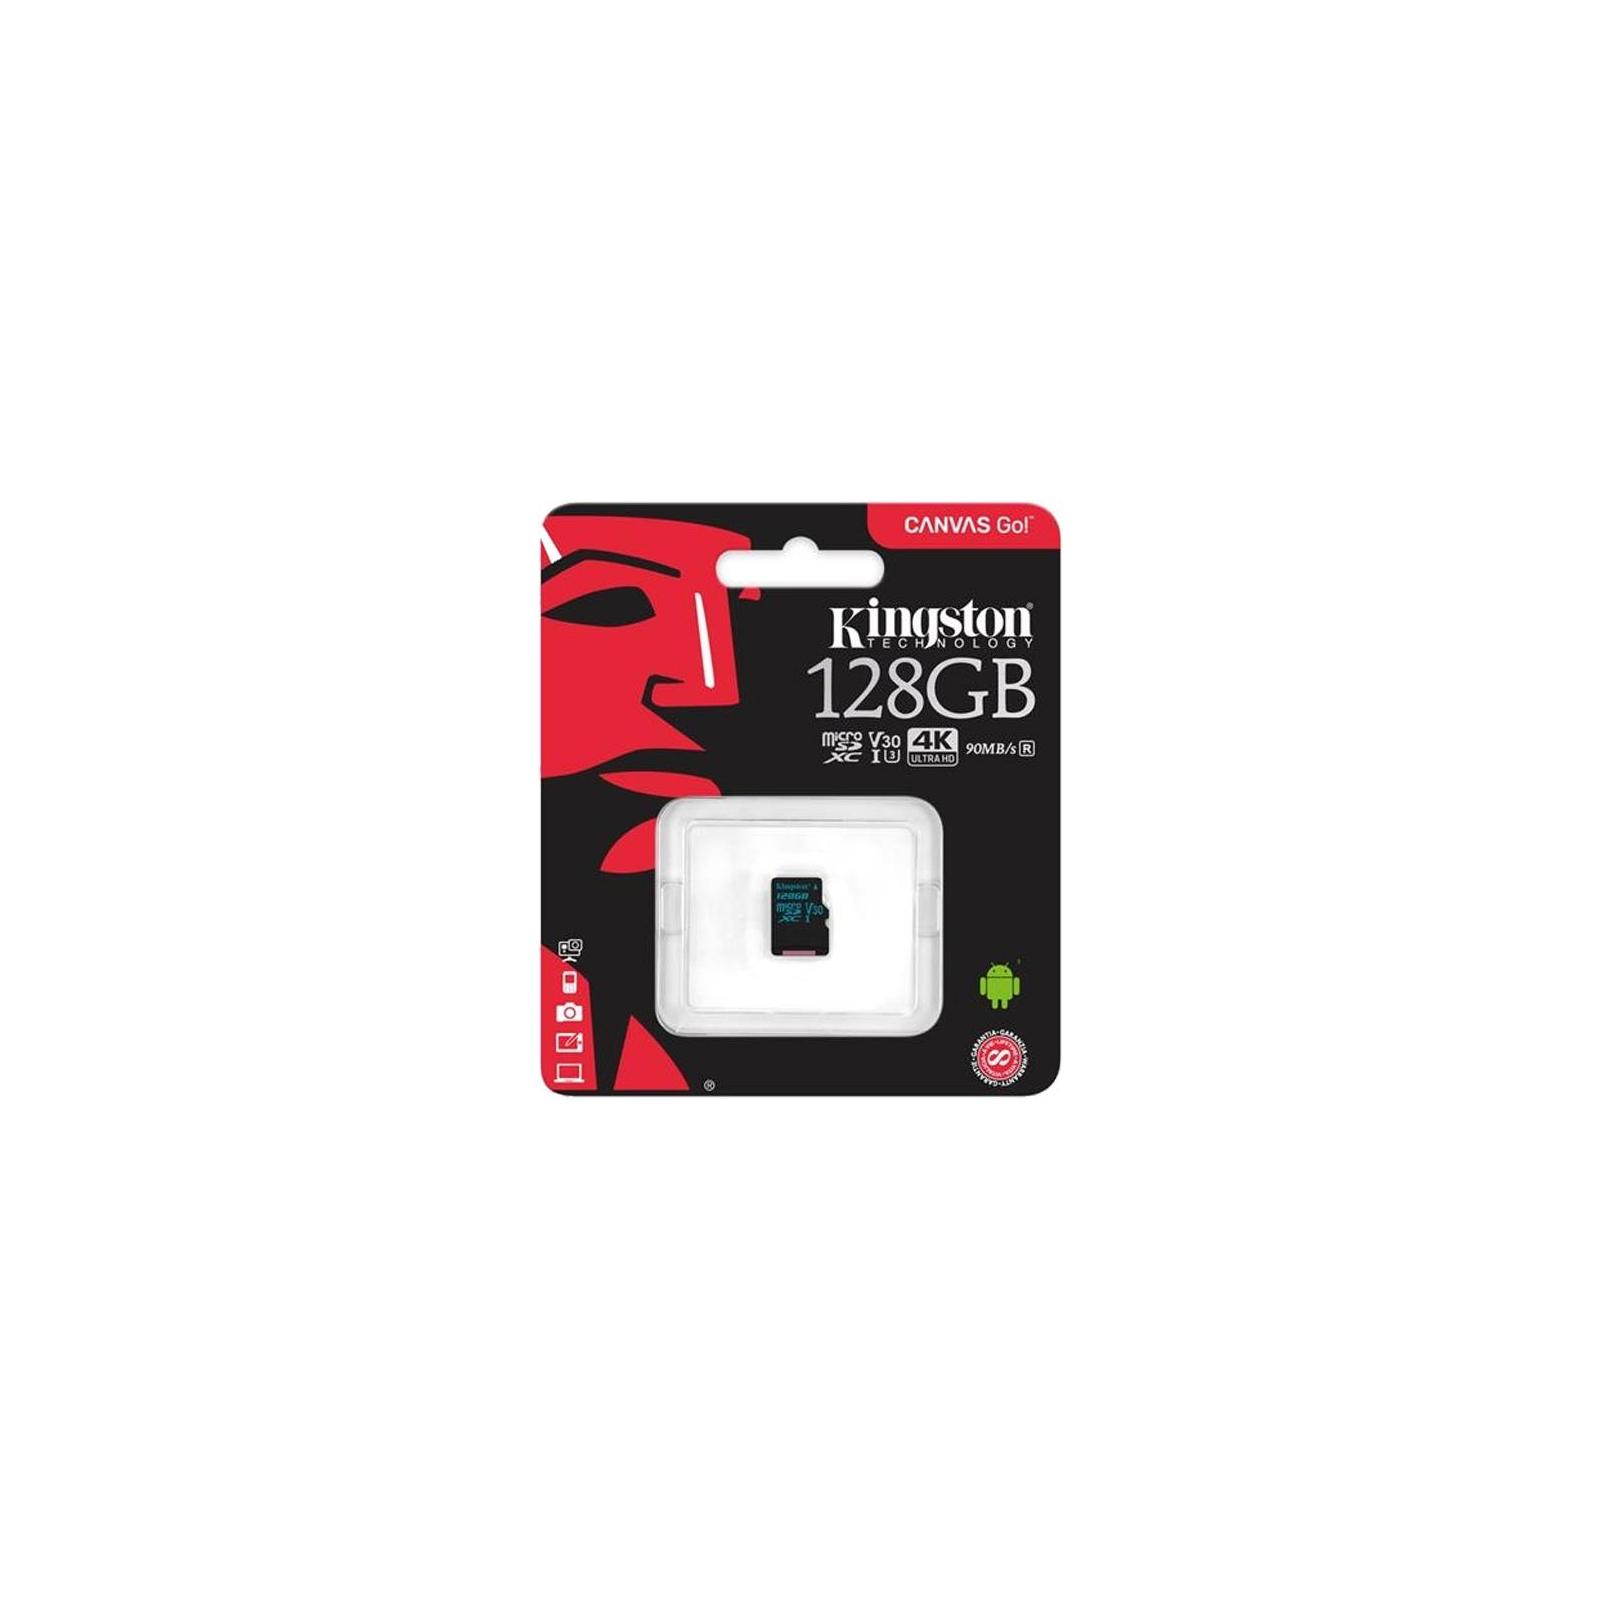 Карта памяти Kingston 128GB microSD class 10 UHS-I U3 Canvas Go (SDCG2/128GBSP) изображение 2